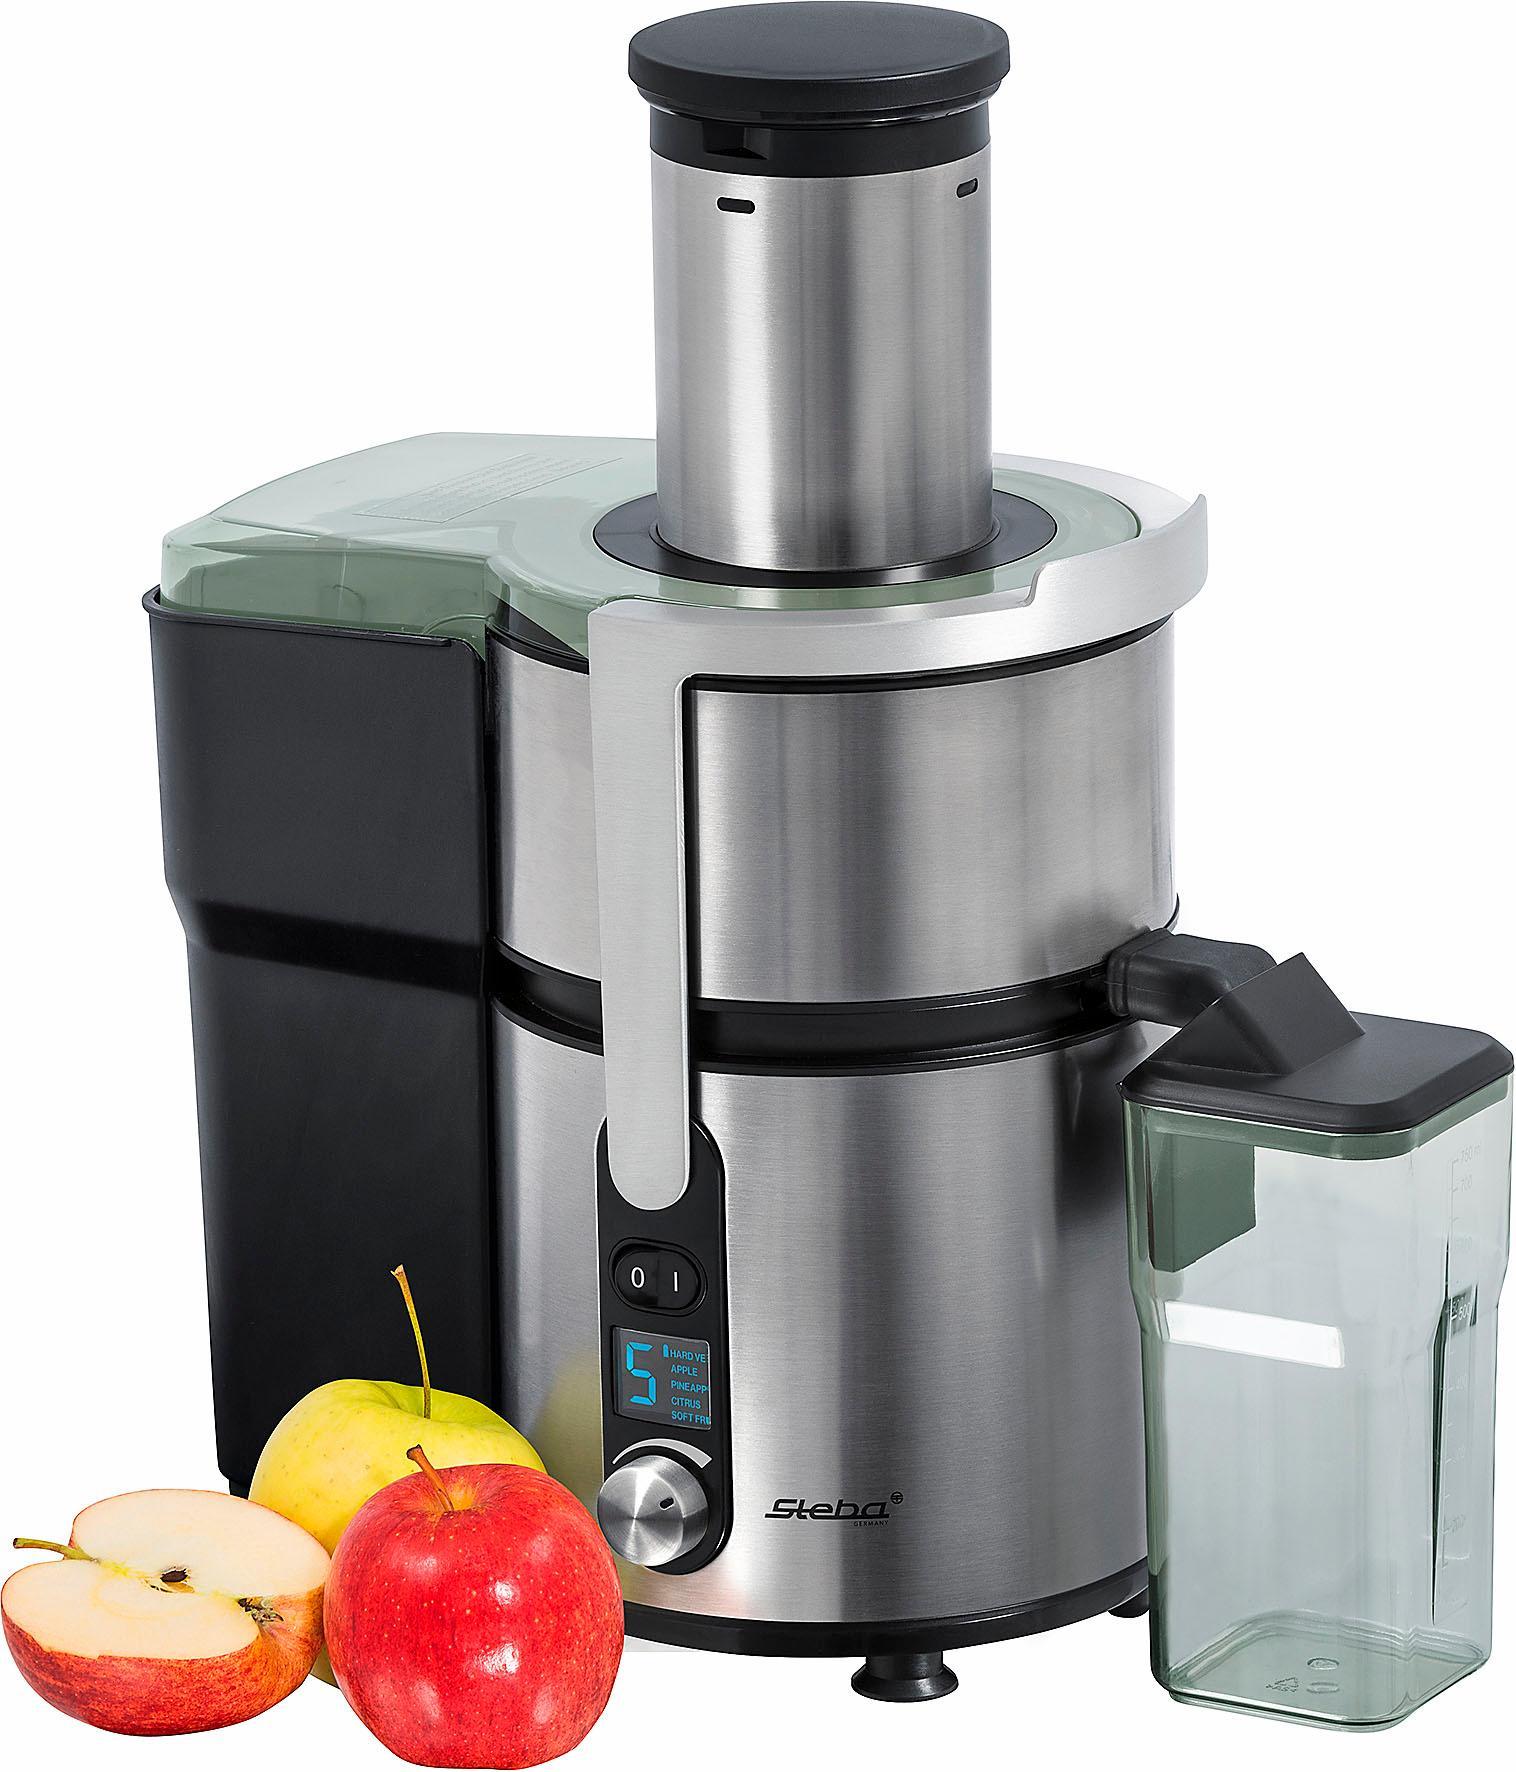 Steba Zentrifugenentsafter E 160, 1000 Watt | Küche und Esszimmer > Küchengeräte > Entsafter | STEBA